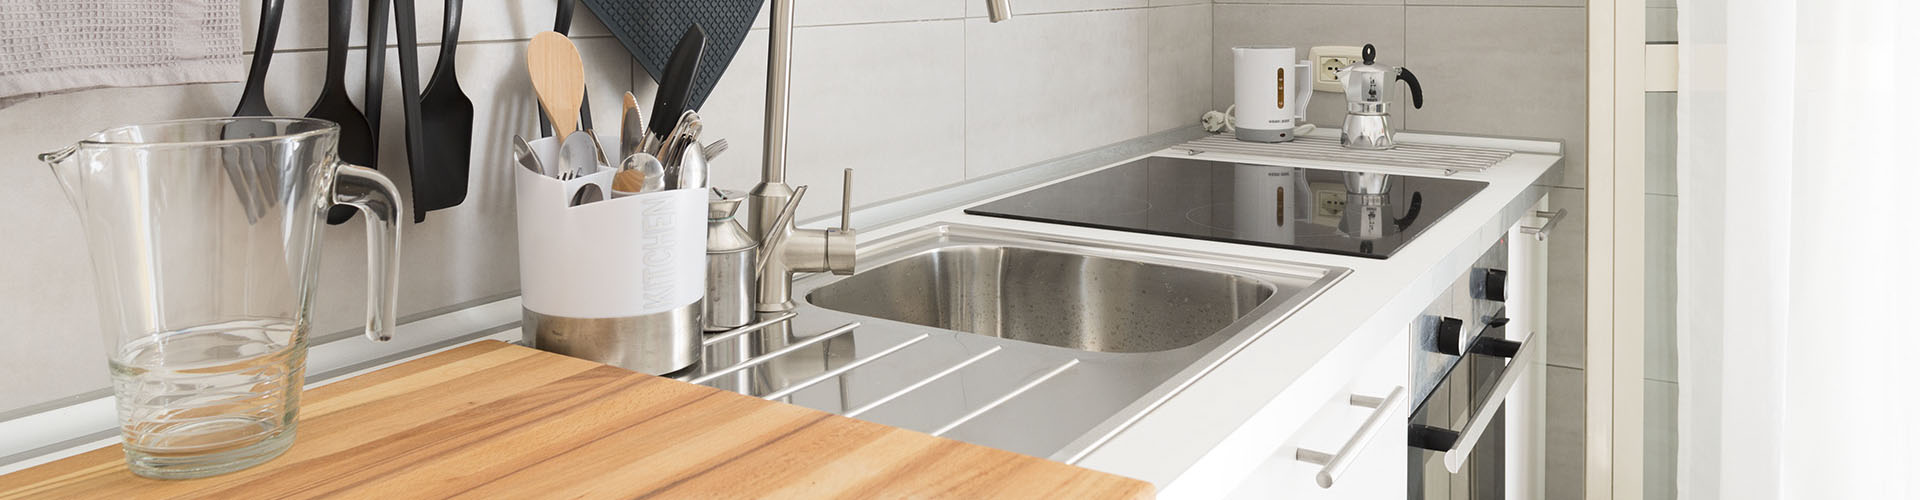 Home Inn Rome - Kitchen detail